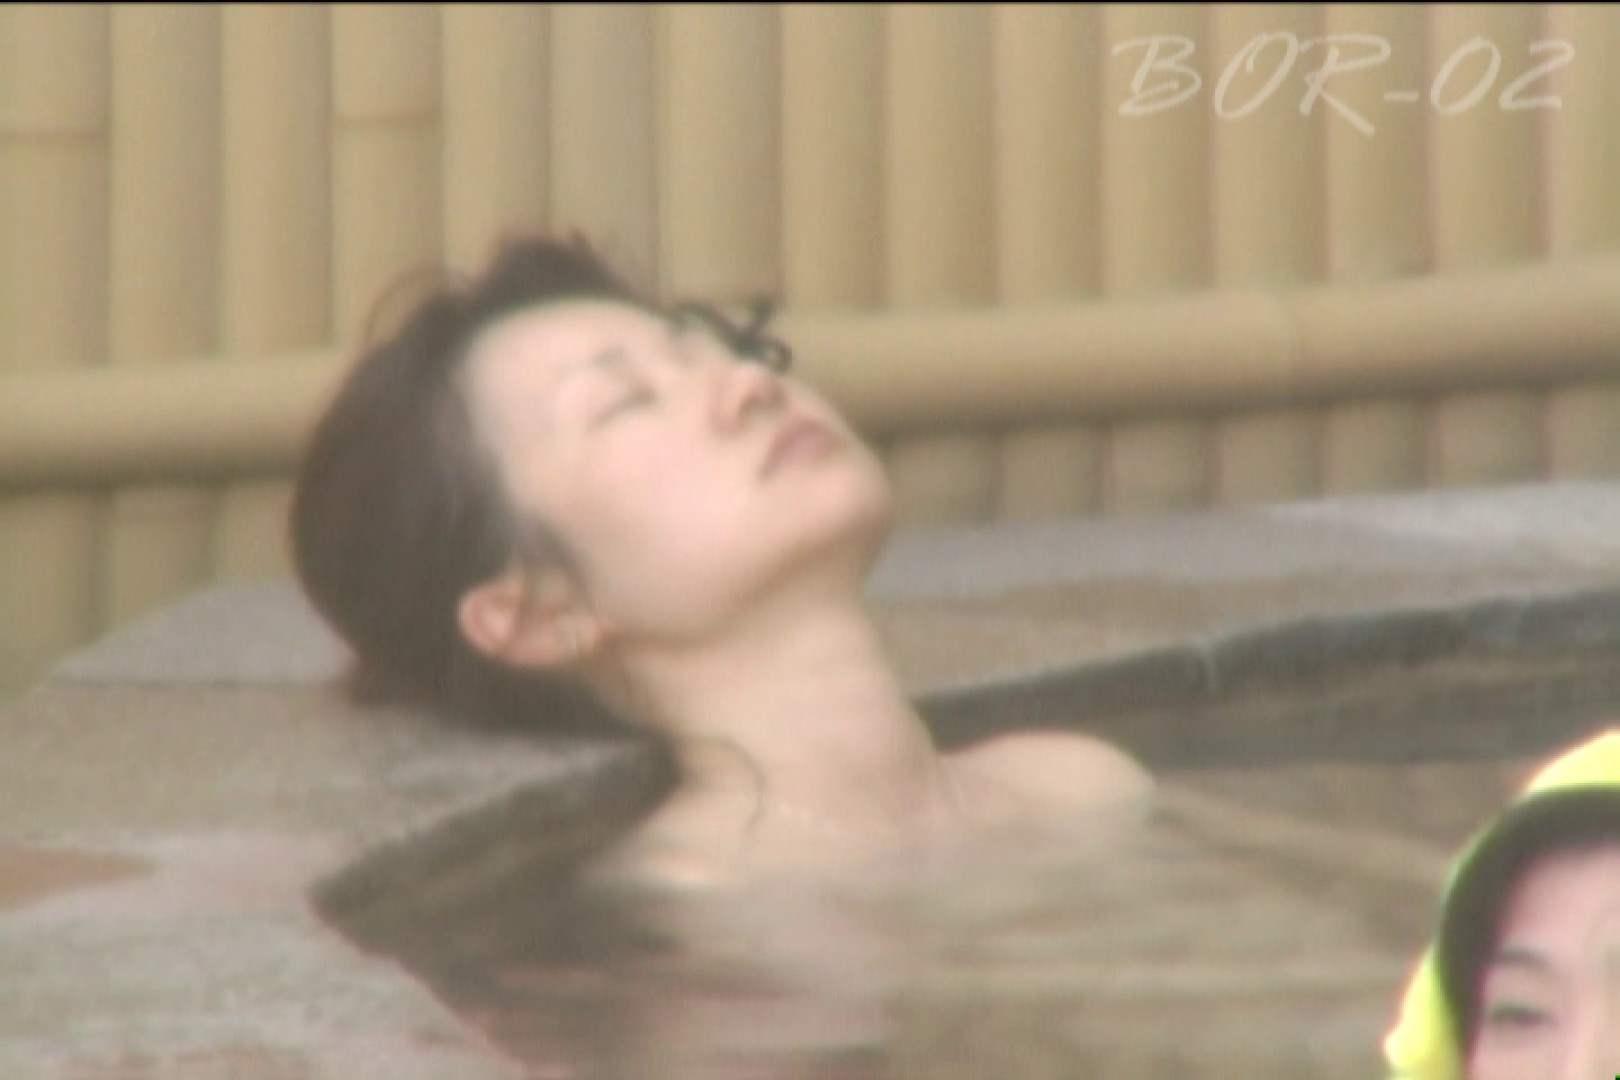 Aquaな露天風呂Vol.477 盗撮   OLエロ画像  99PICs 28